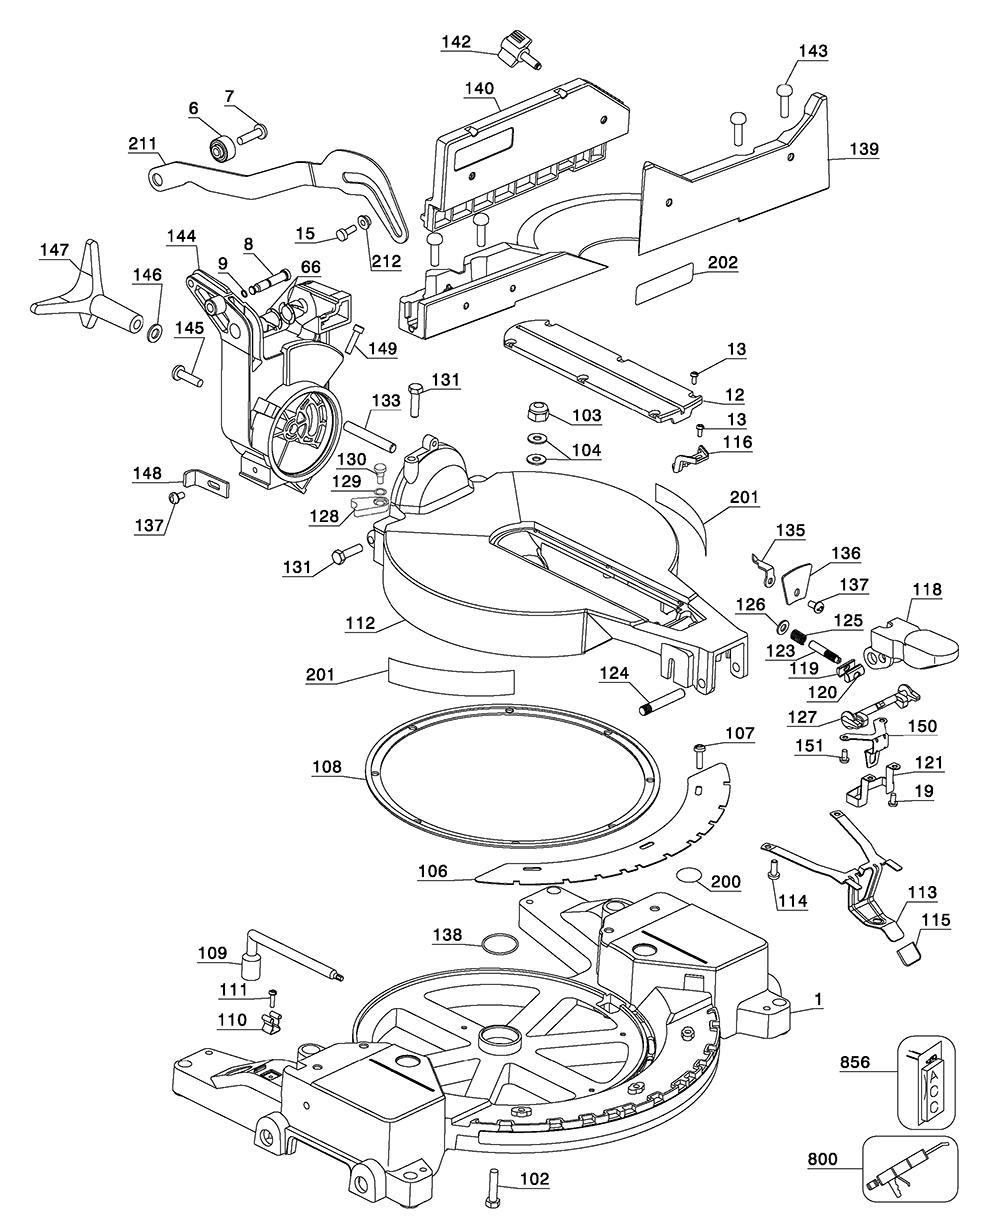 peugeot 306 meridian wiring diagram